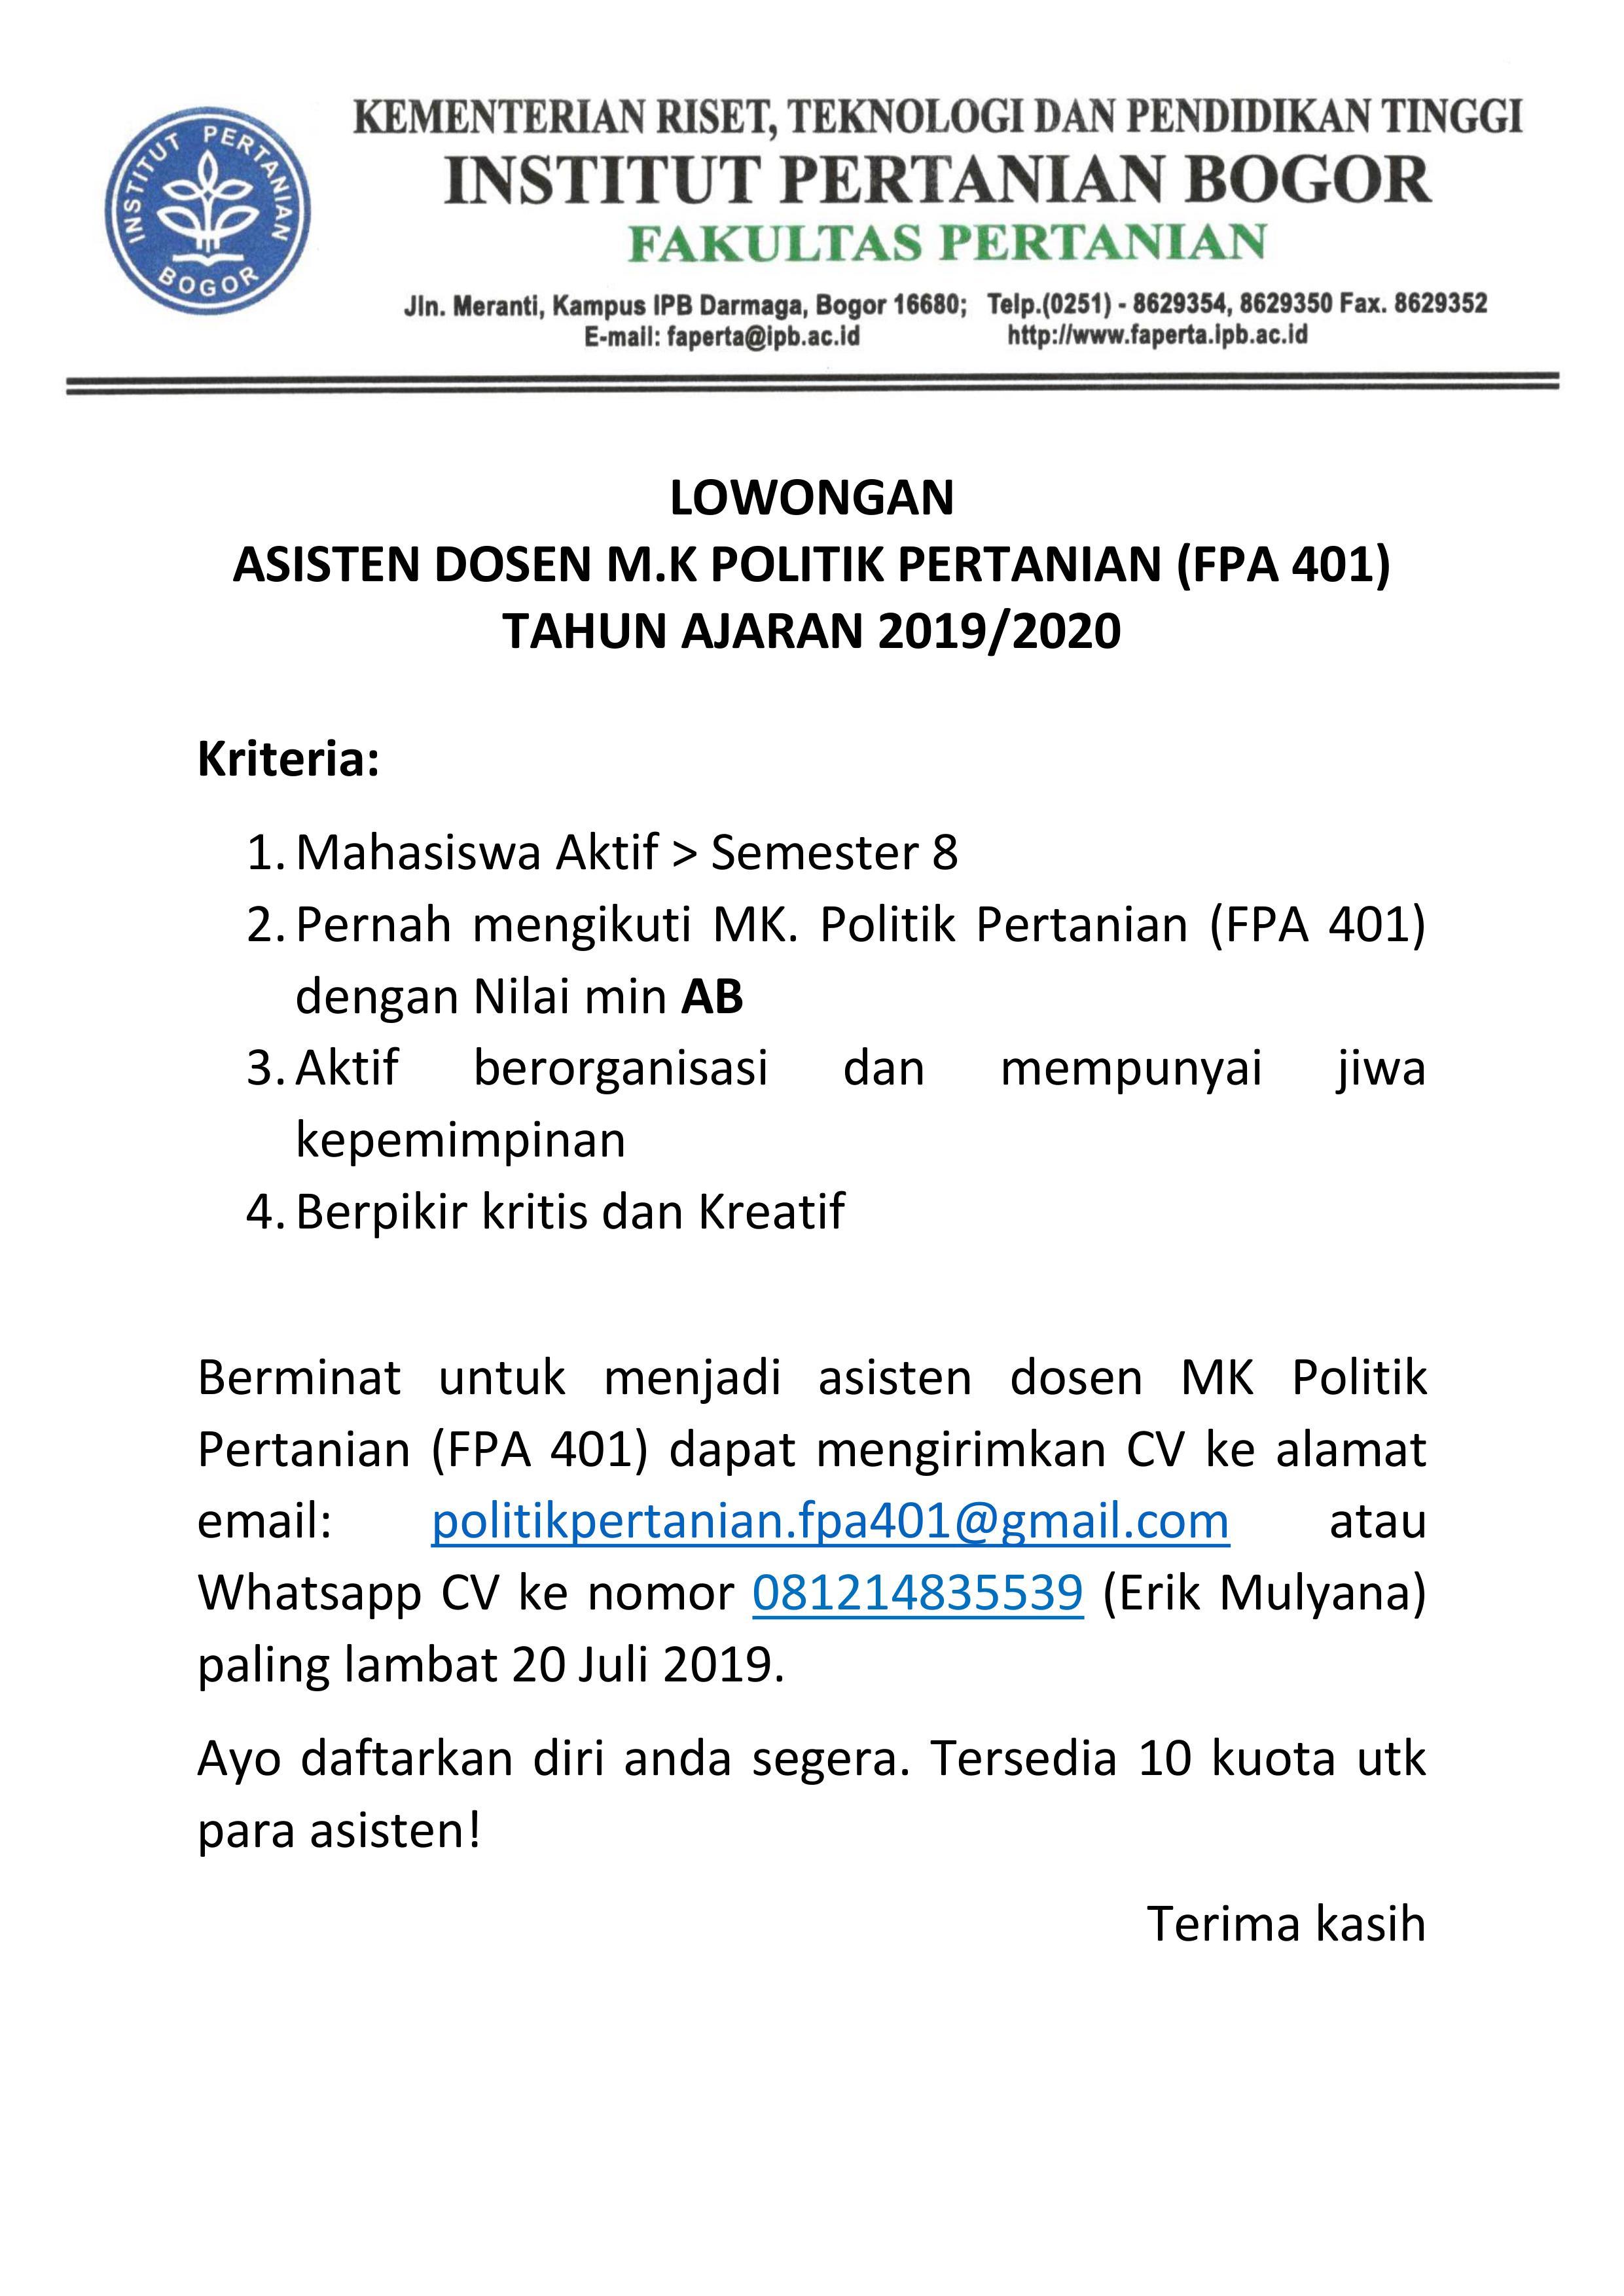 Lowongan Asisten Dosen Mk Politik Pertanian Faperta Ipb